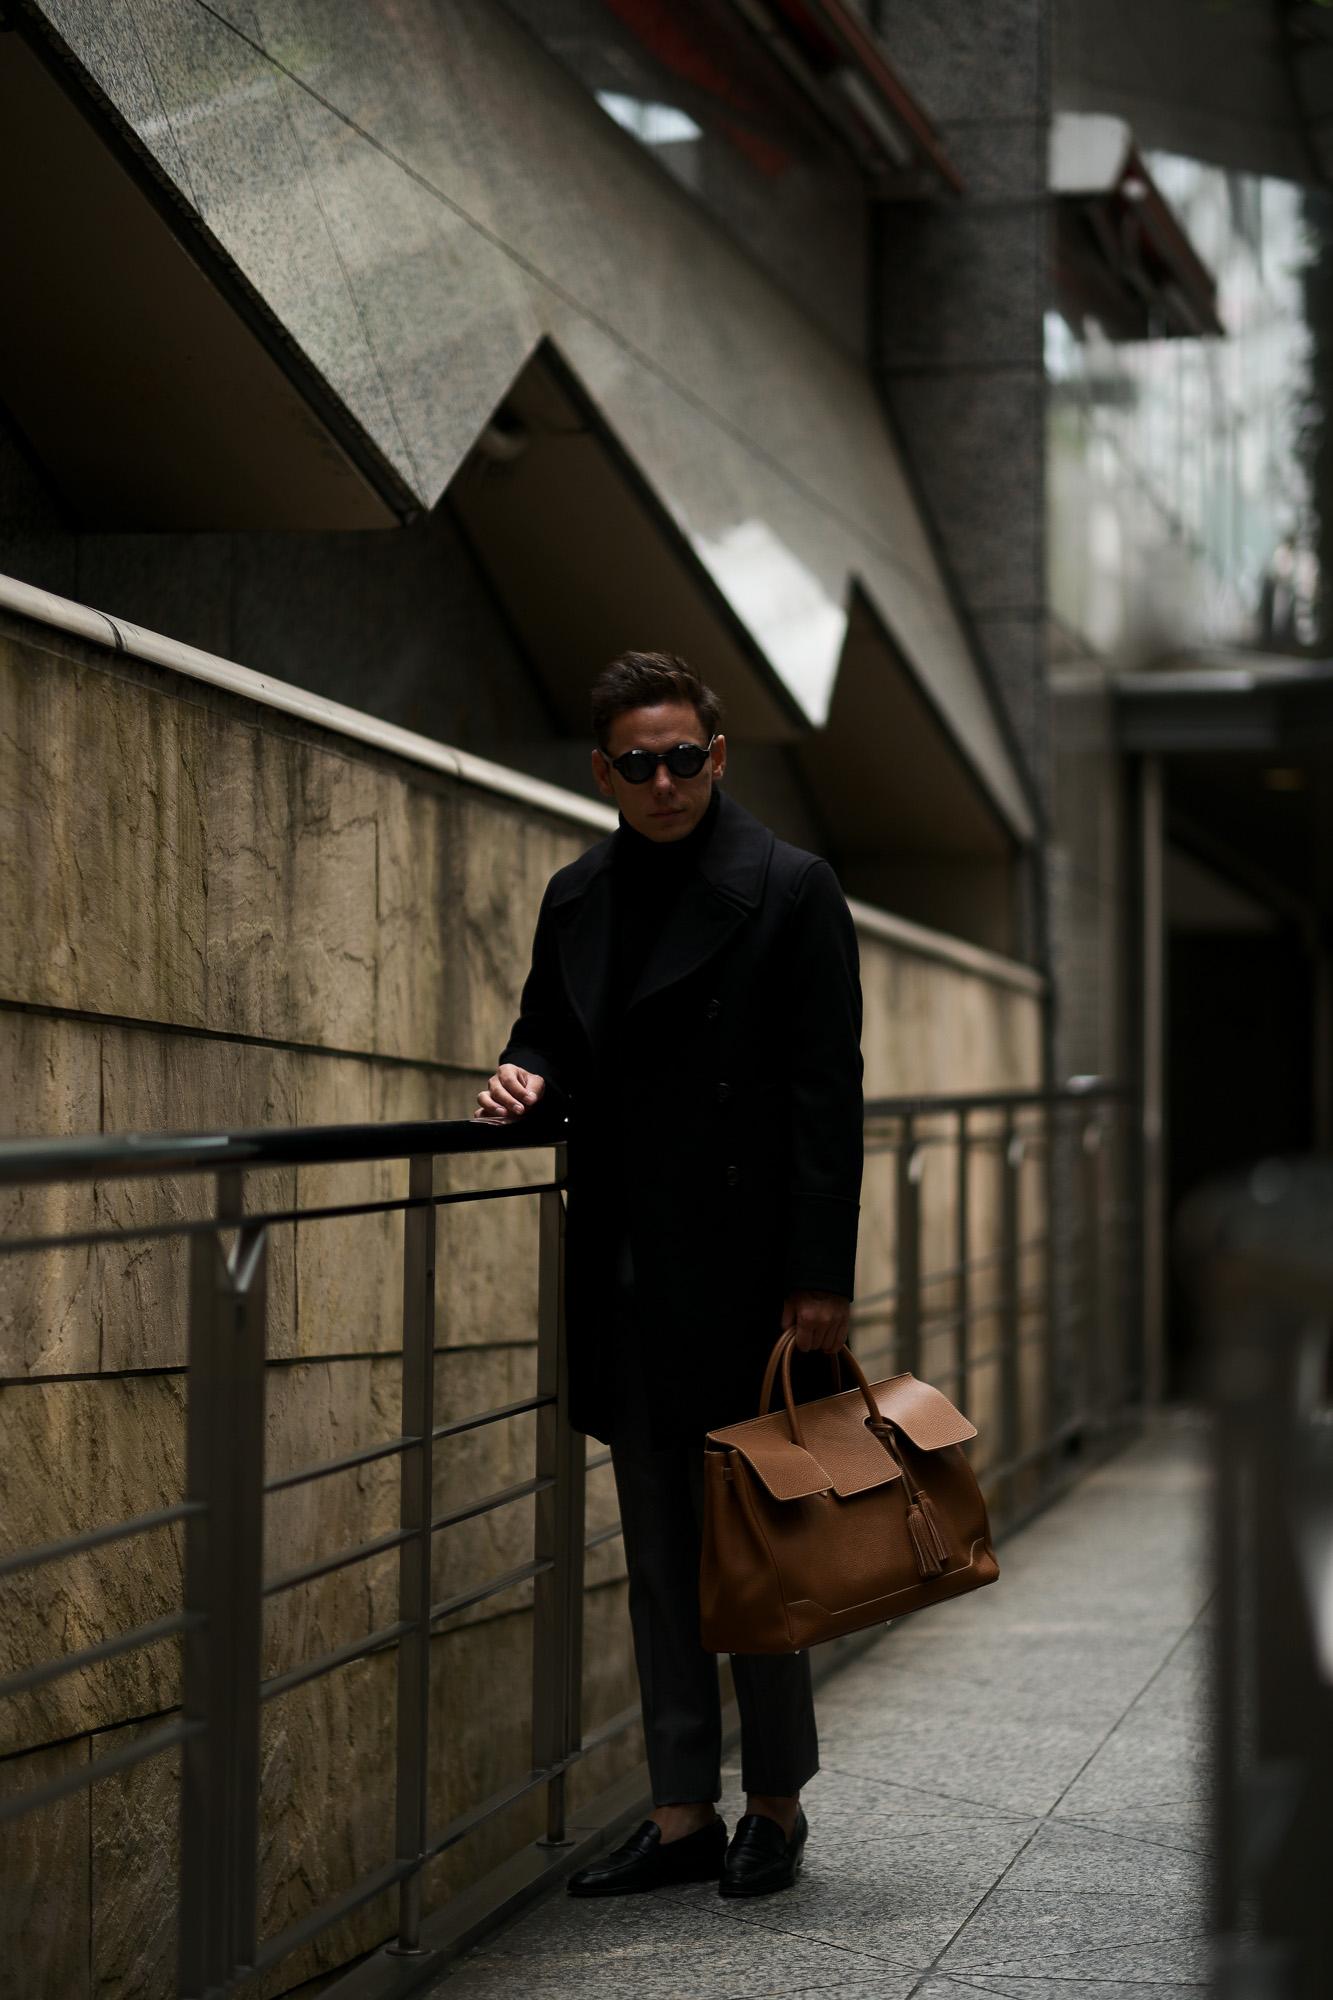 ACATE(アカーテ)OSTRO-M(オストロ-M) Montblanc leather(モンブランレザー) トートバック レザーバック CUOIO(クオイオ) MADE IN ITALY(イタリア製) 2019 秋冬新作 愛知 名古屋 altoediritto アルトエデリット トートバック